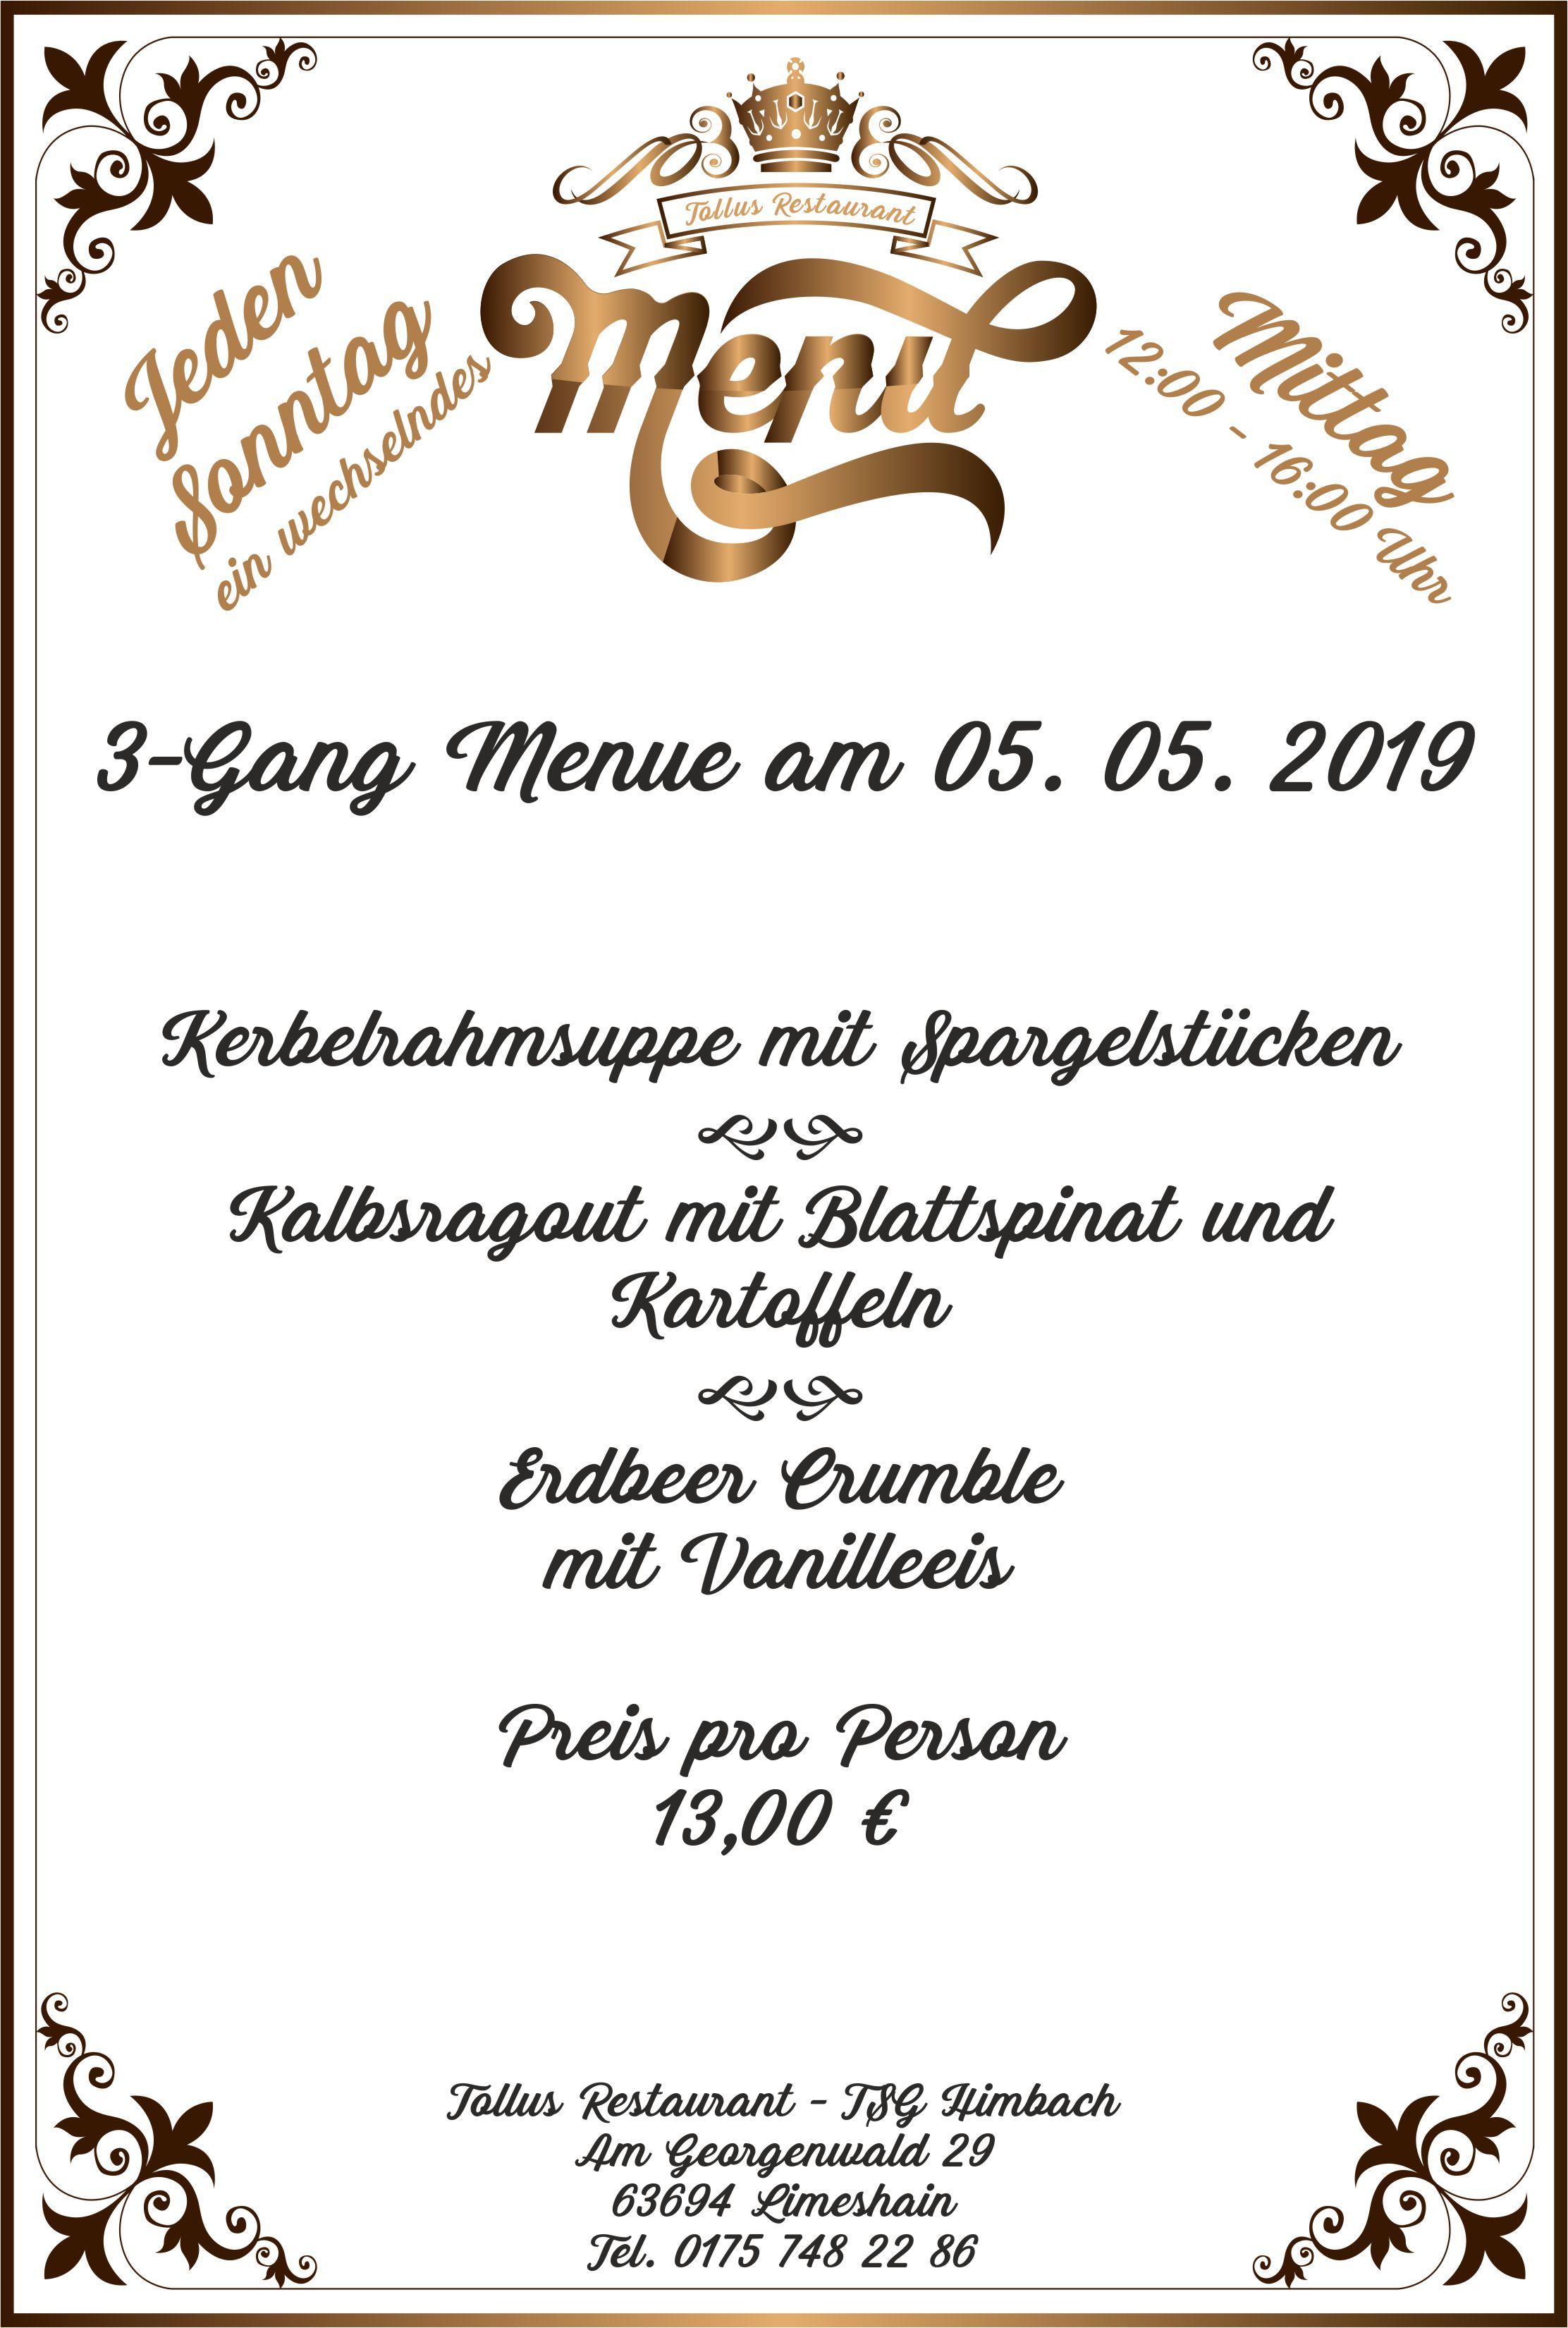 Sonntags Mittags Menue 05. 05. 2019